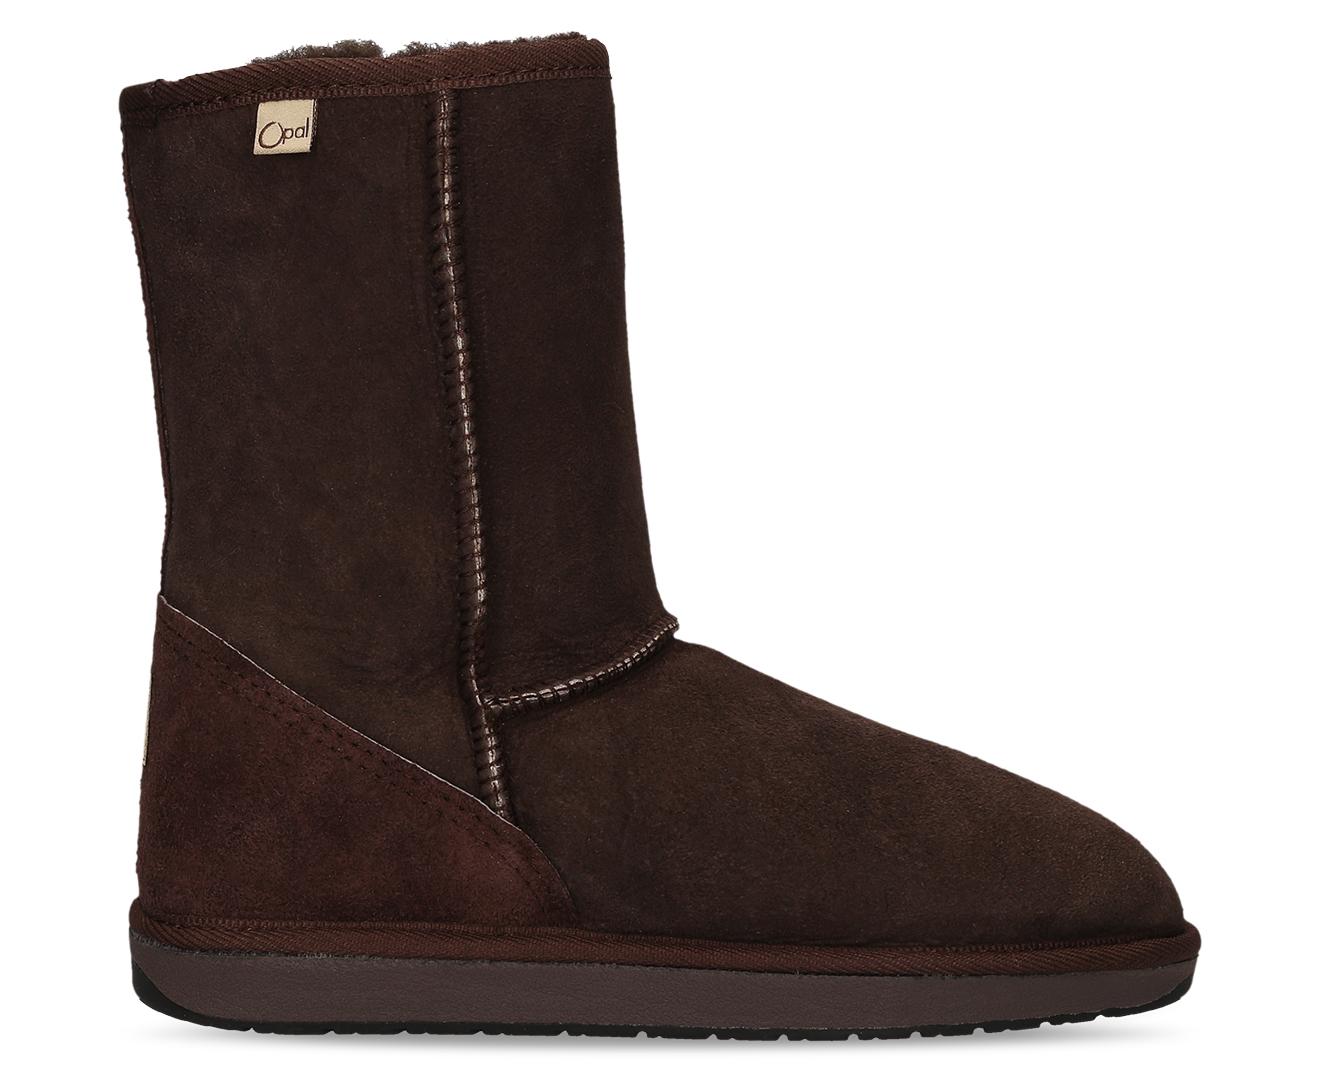 d270cbc72f4 Details about Opal UGG Australian Made Tidal 3/4 Sheepskin Boots - Chocolate